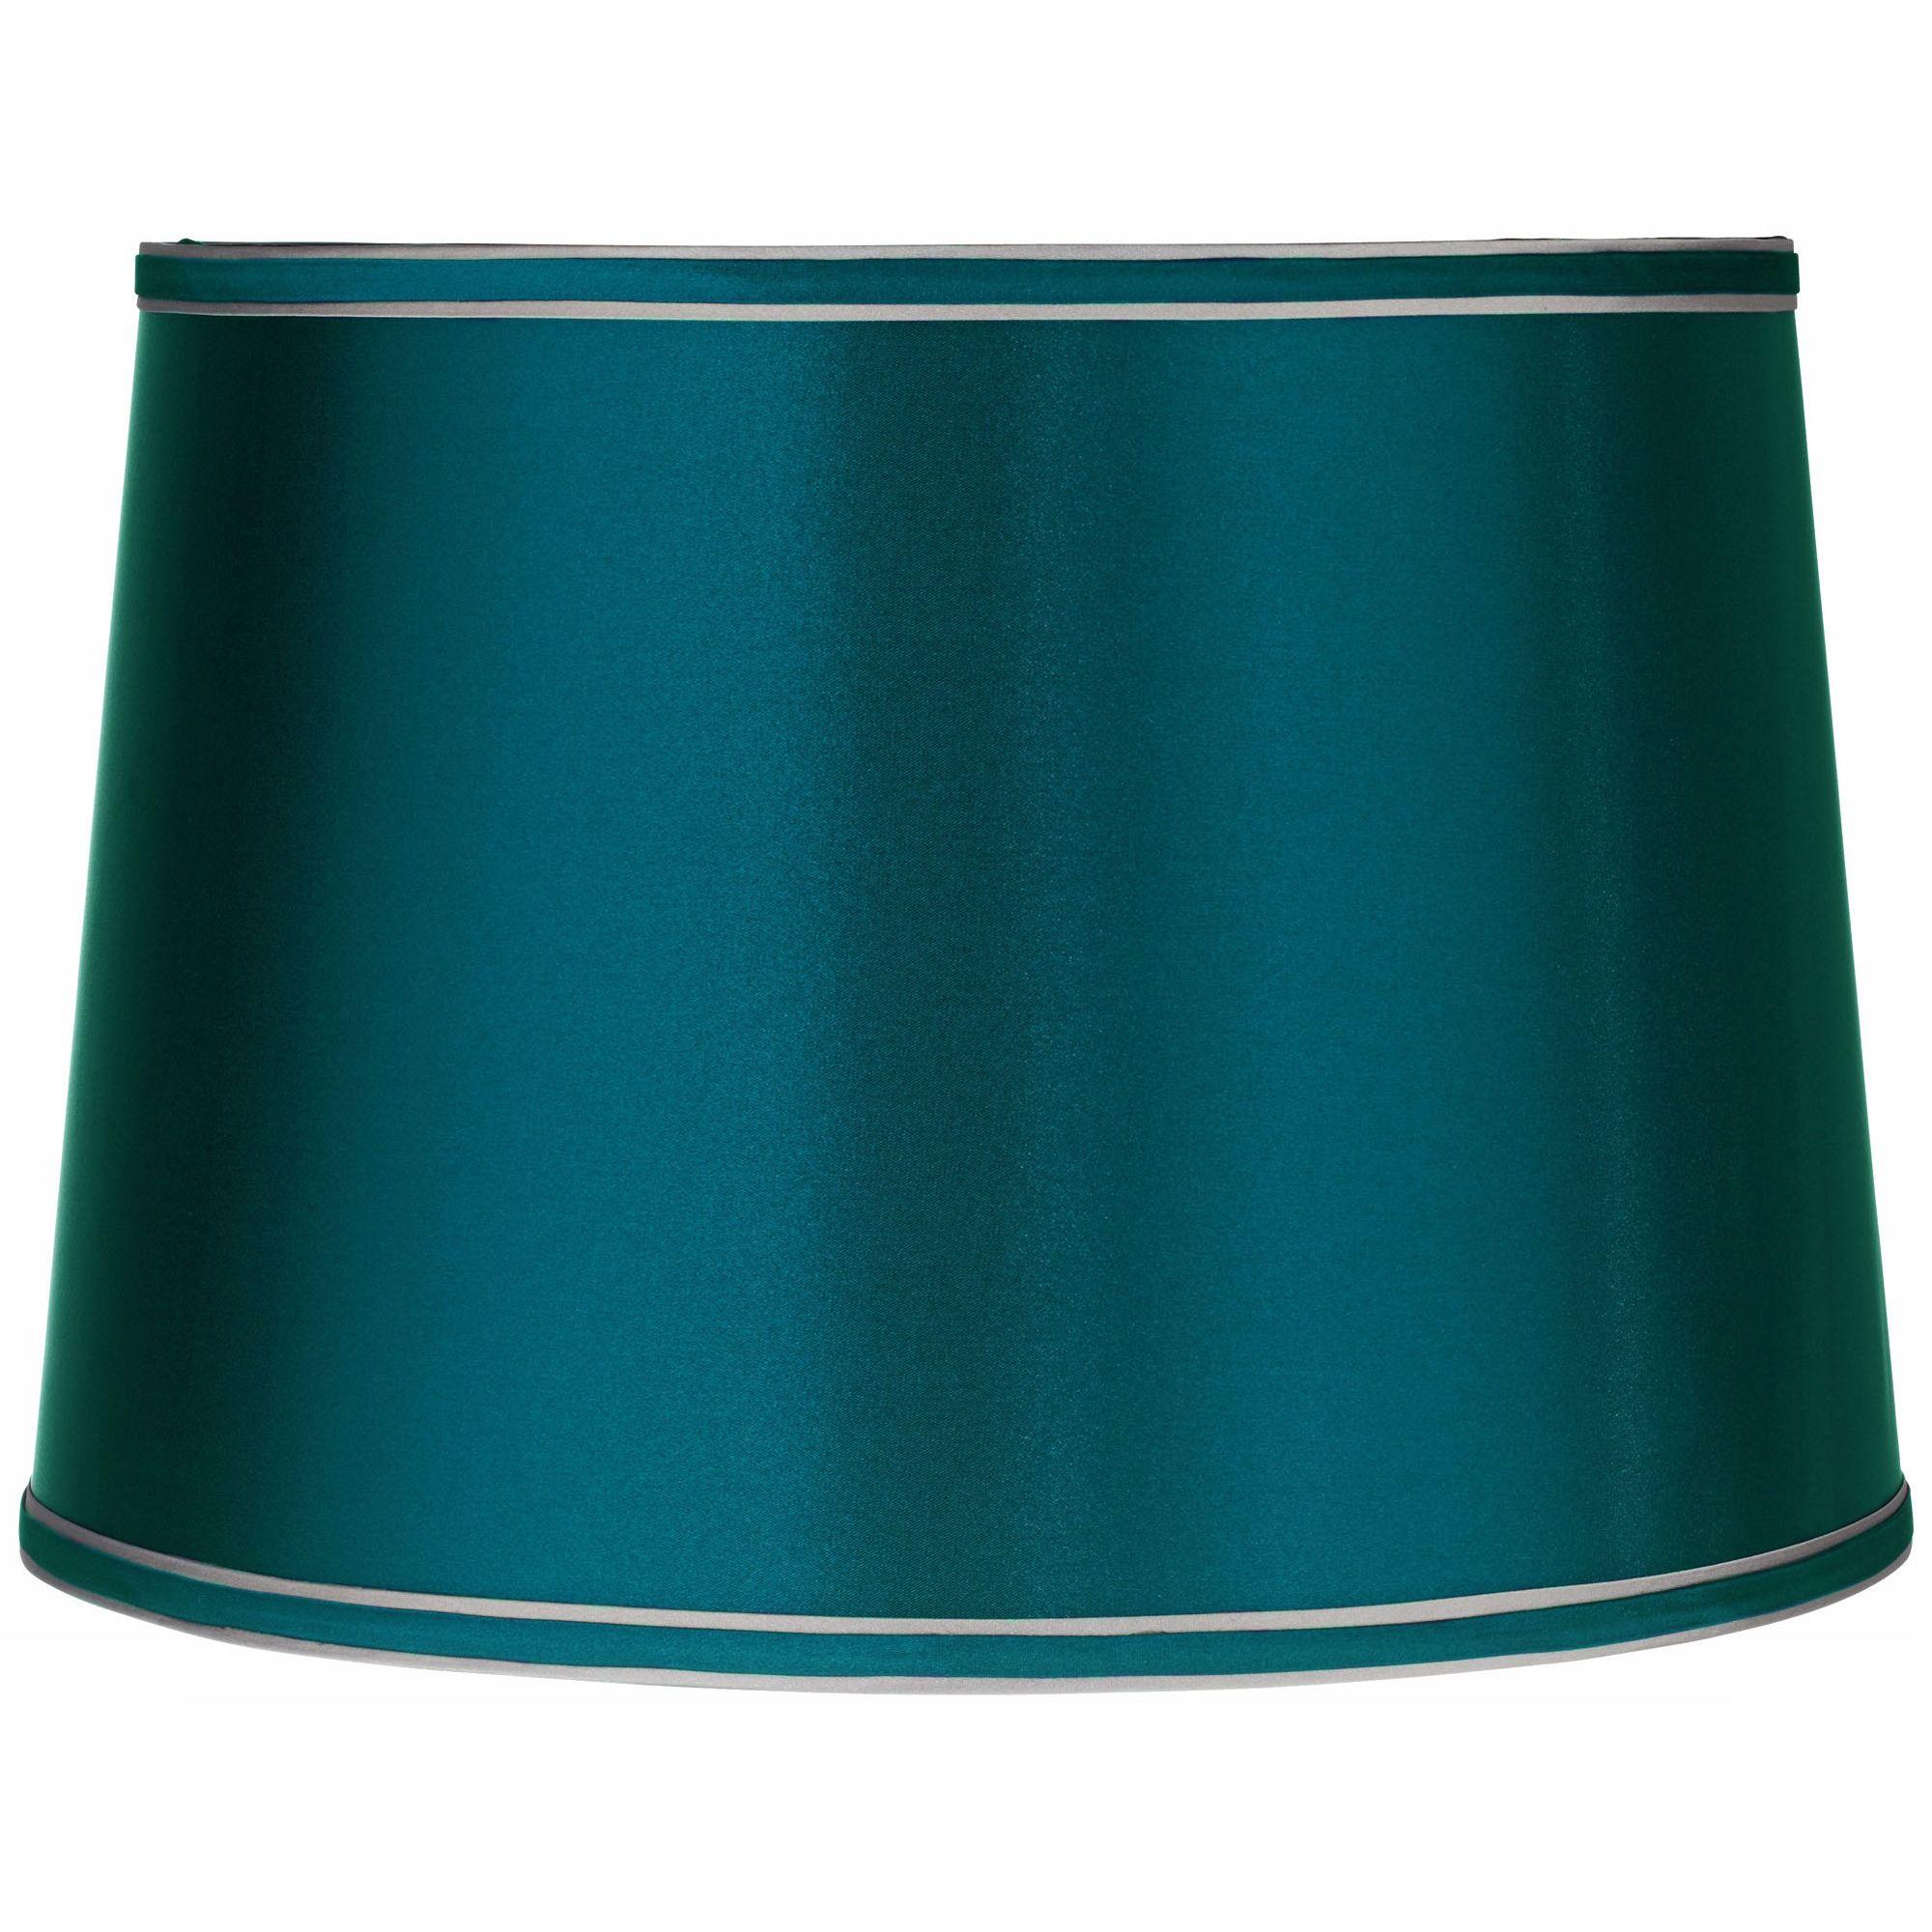 Brentwood Sydnee Satin Teal Blue Drum Lamp Shade 14X16x11 (Spider)